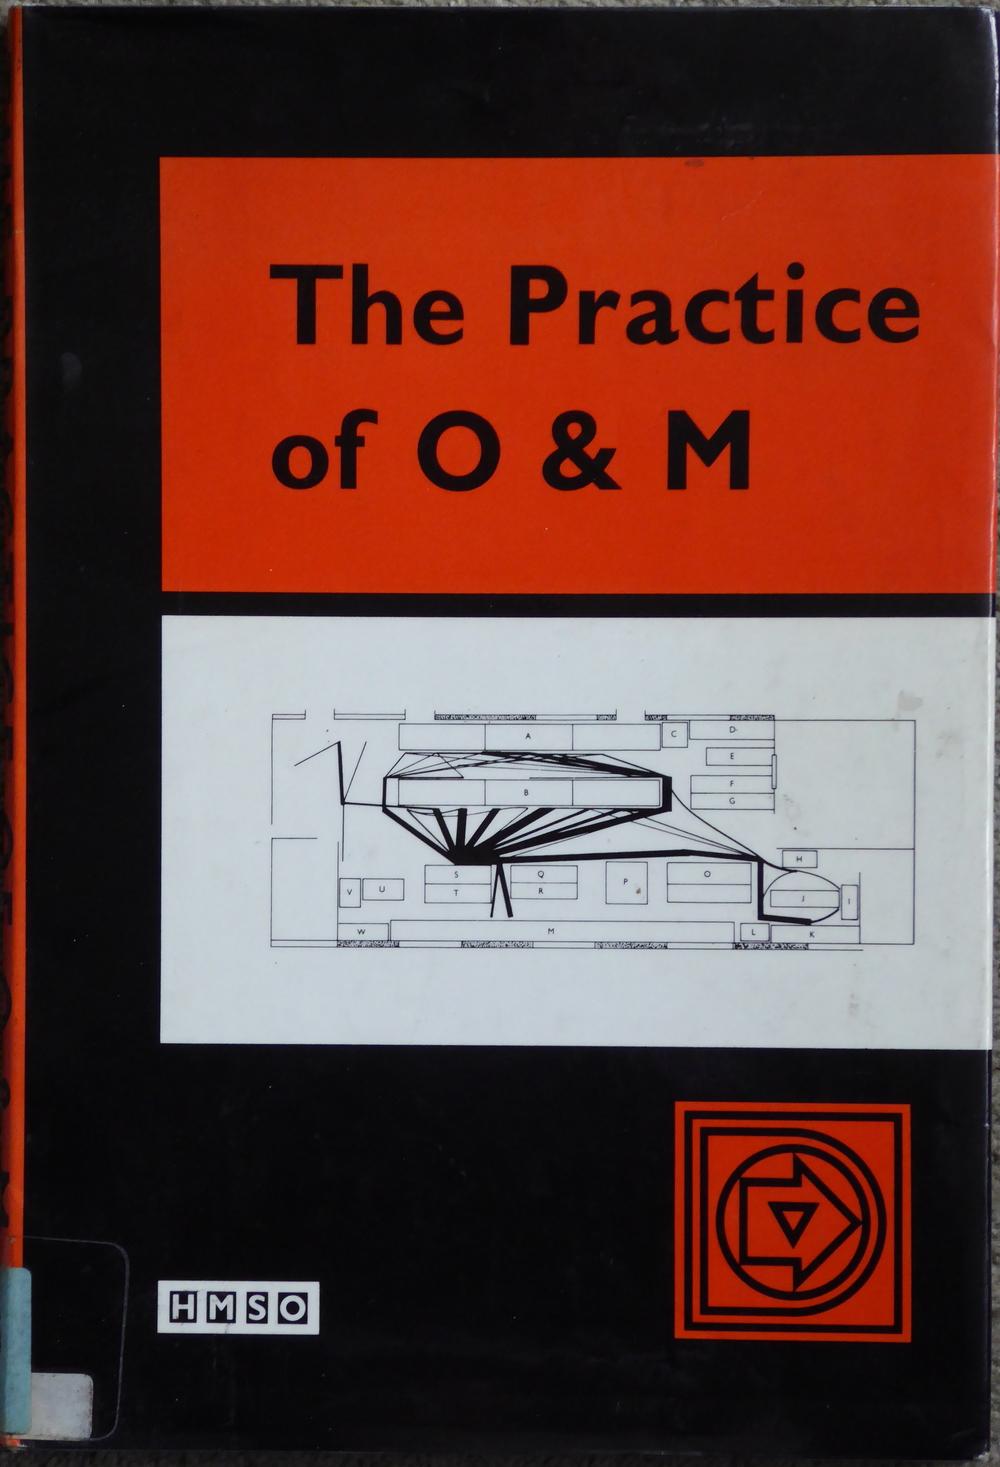 DDR_P1010069_HMSO_PracticeOfO&M.JPG